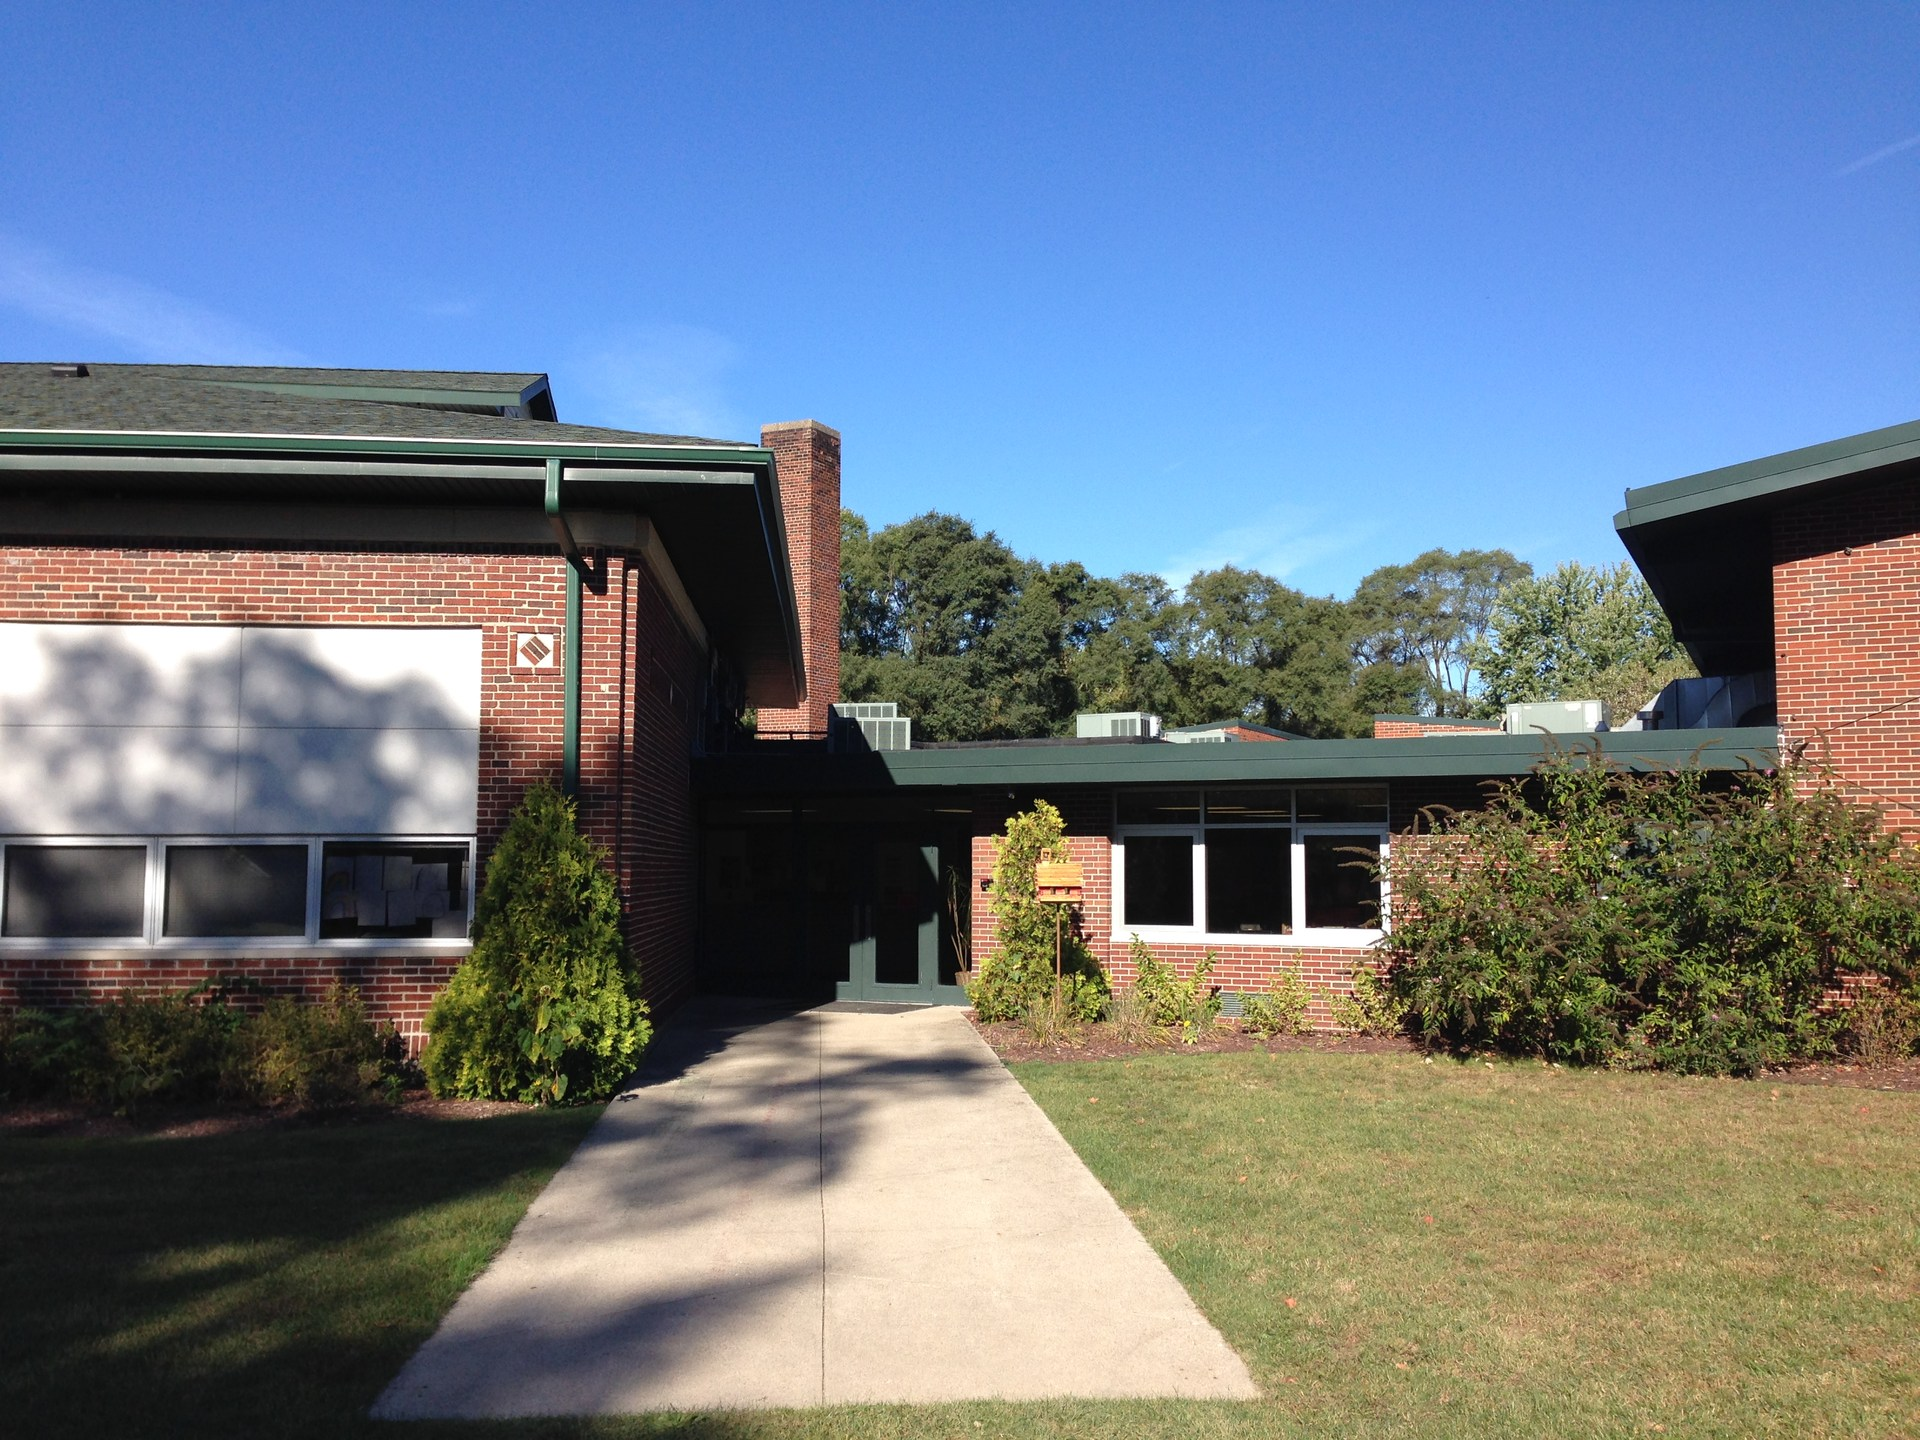 Millburg Front Building